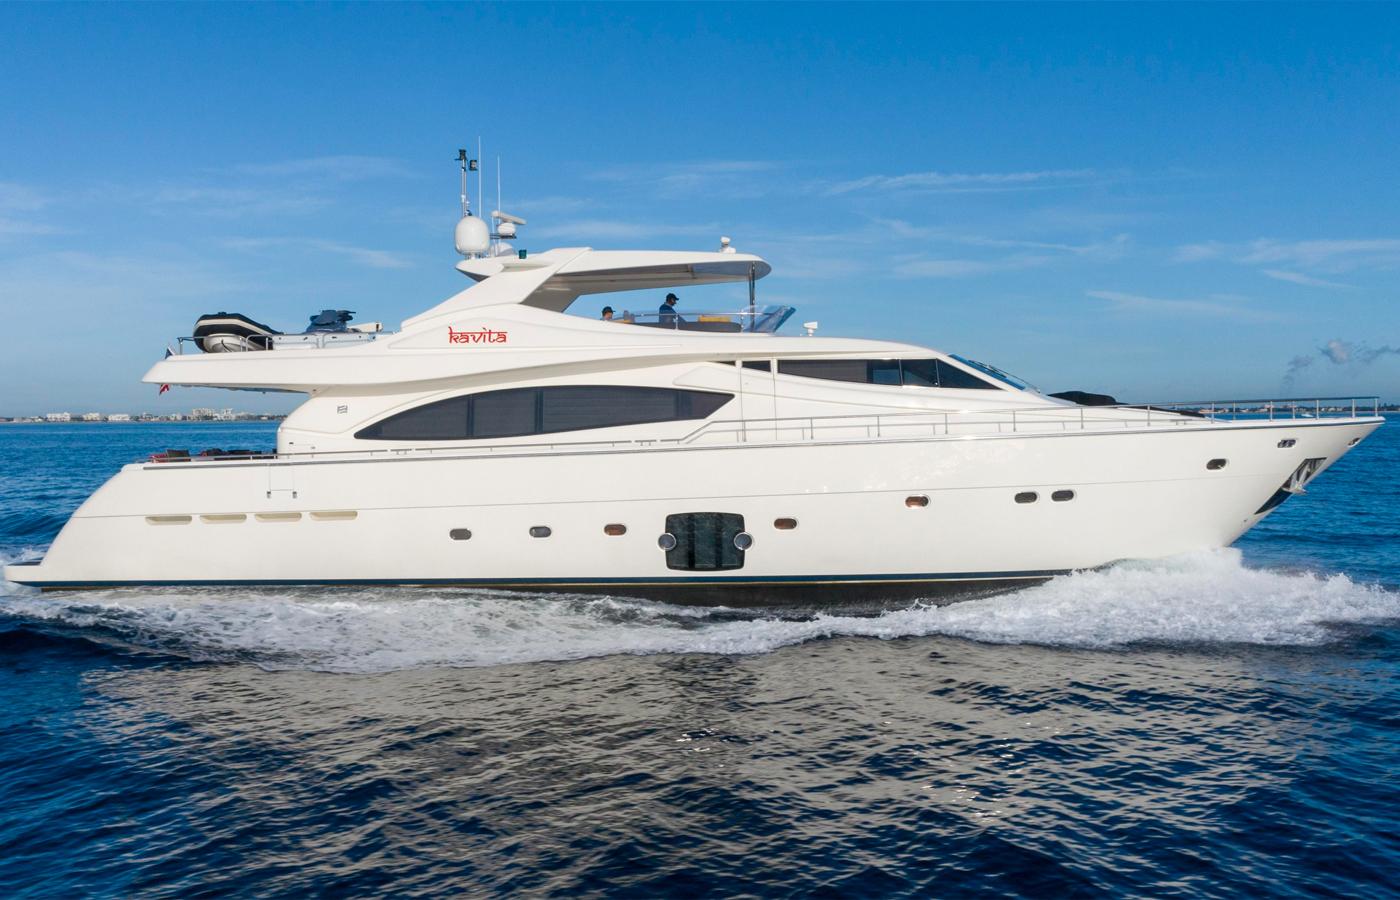 Ferretti 88 Superyacht Highlight [Boat Review + Video]